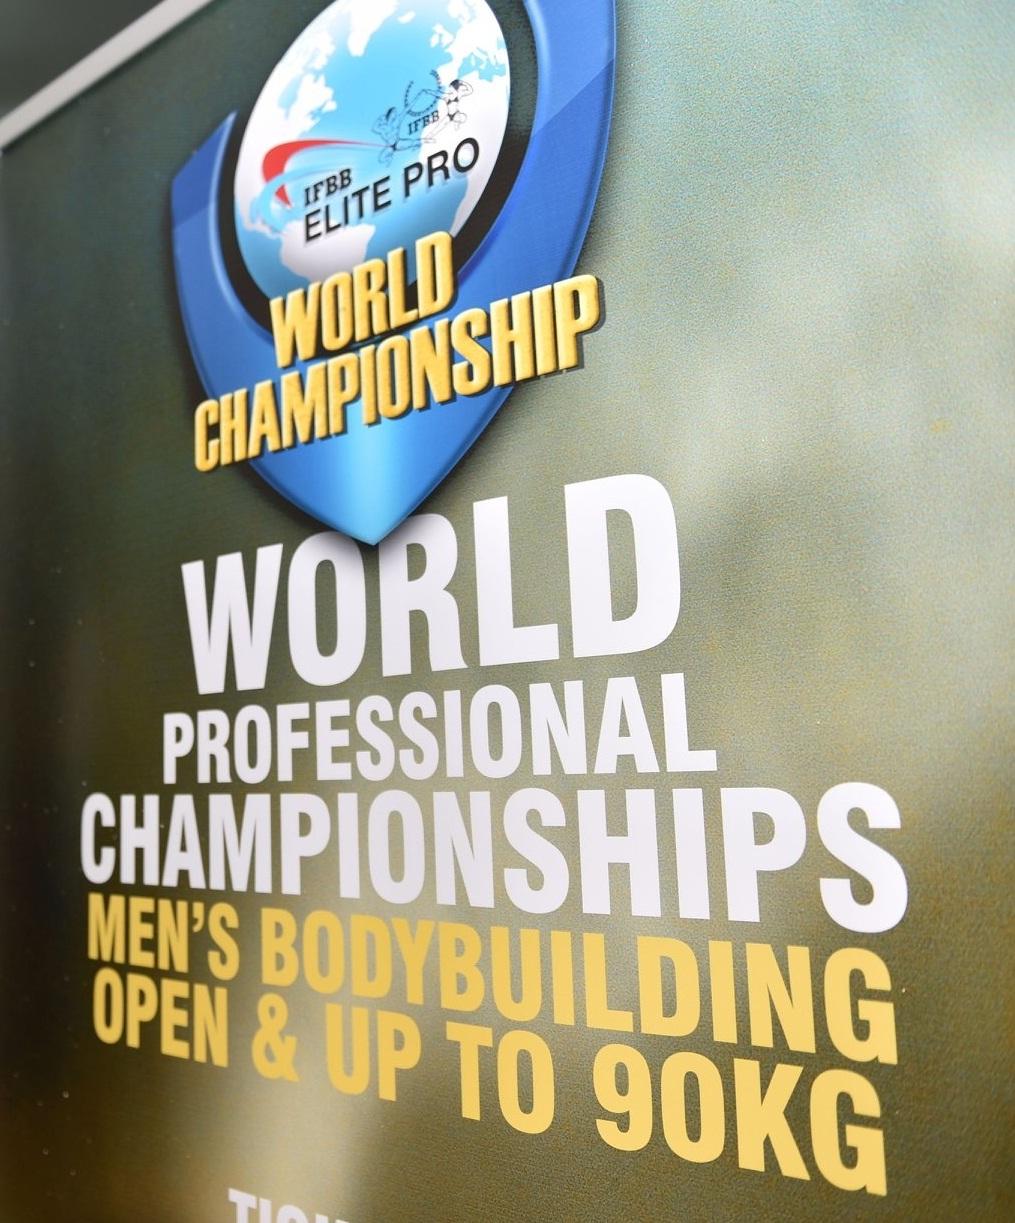 world champ 2018 Benidorm (2) - copia